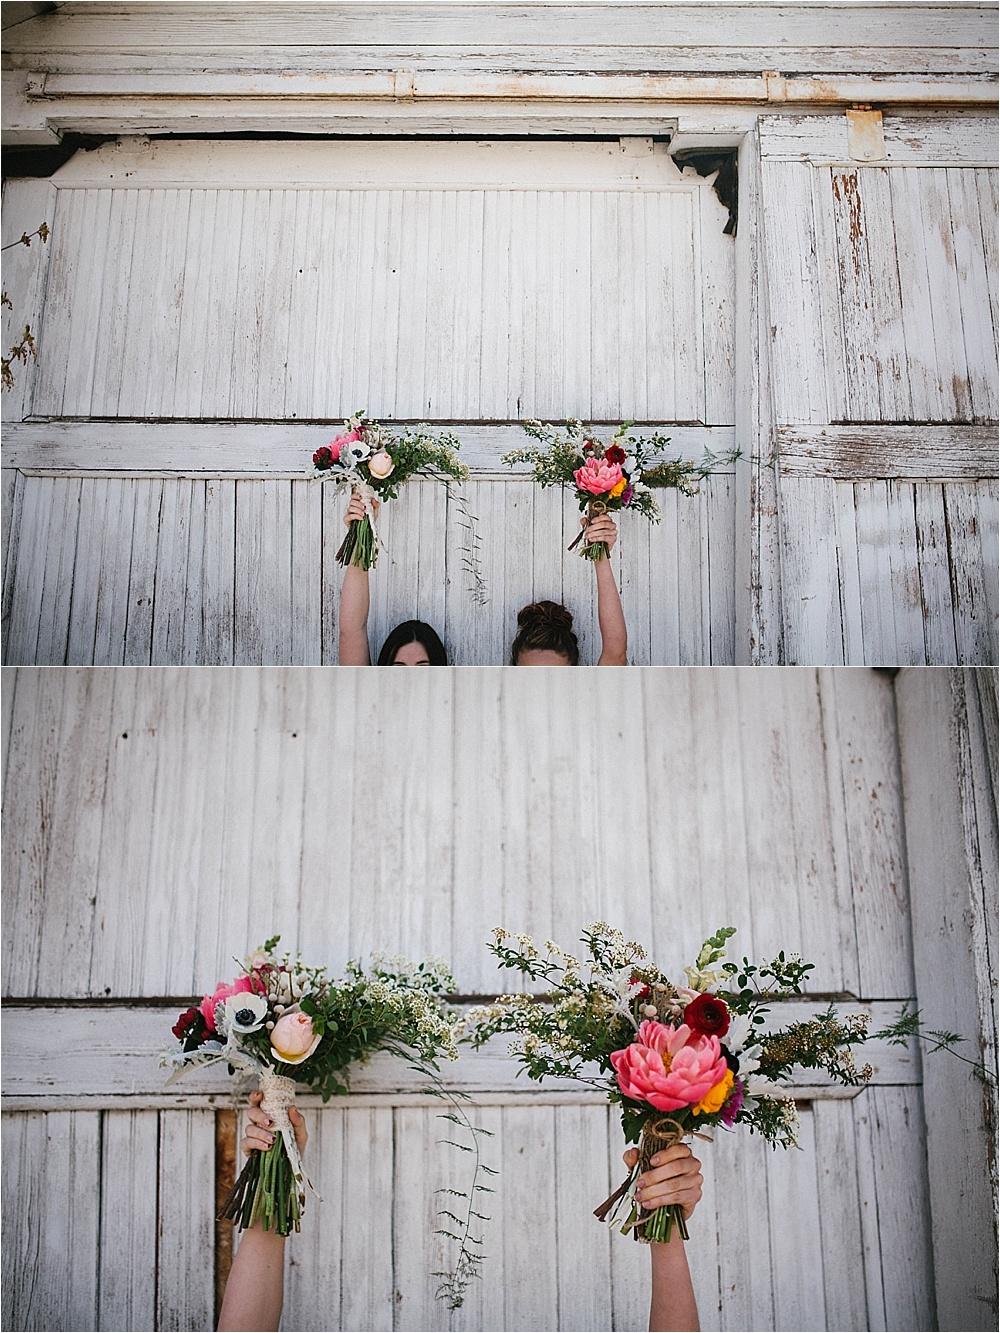 manzanita photo by rebecca caridad wedding lifestlye photography floral design calligraphy_1263.jpg